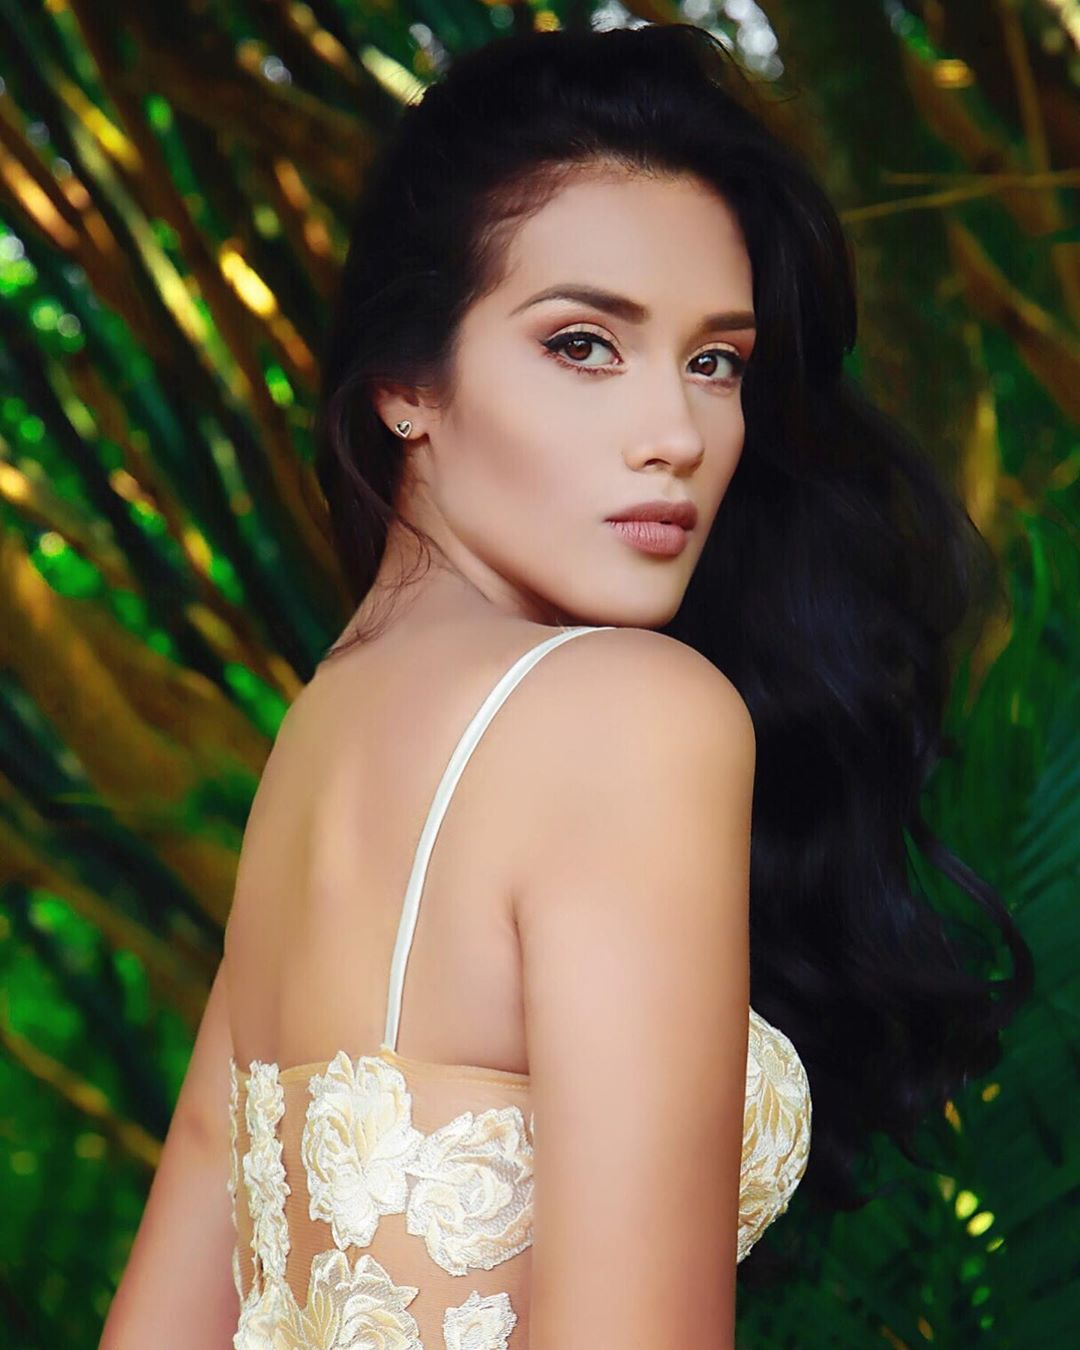 yenny katherine carrillo, top 20 de miss earth 2019/reyna mundial banano 2017. - Página 6 69875610